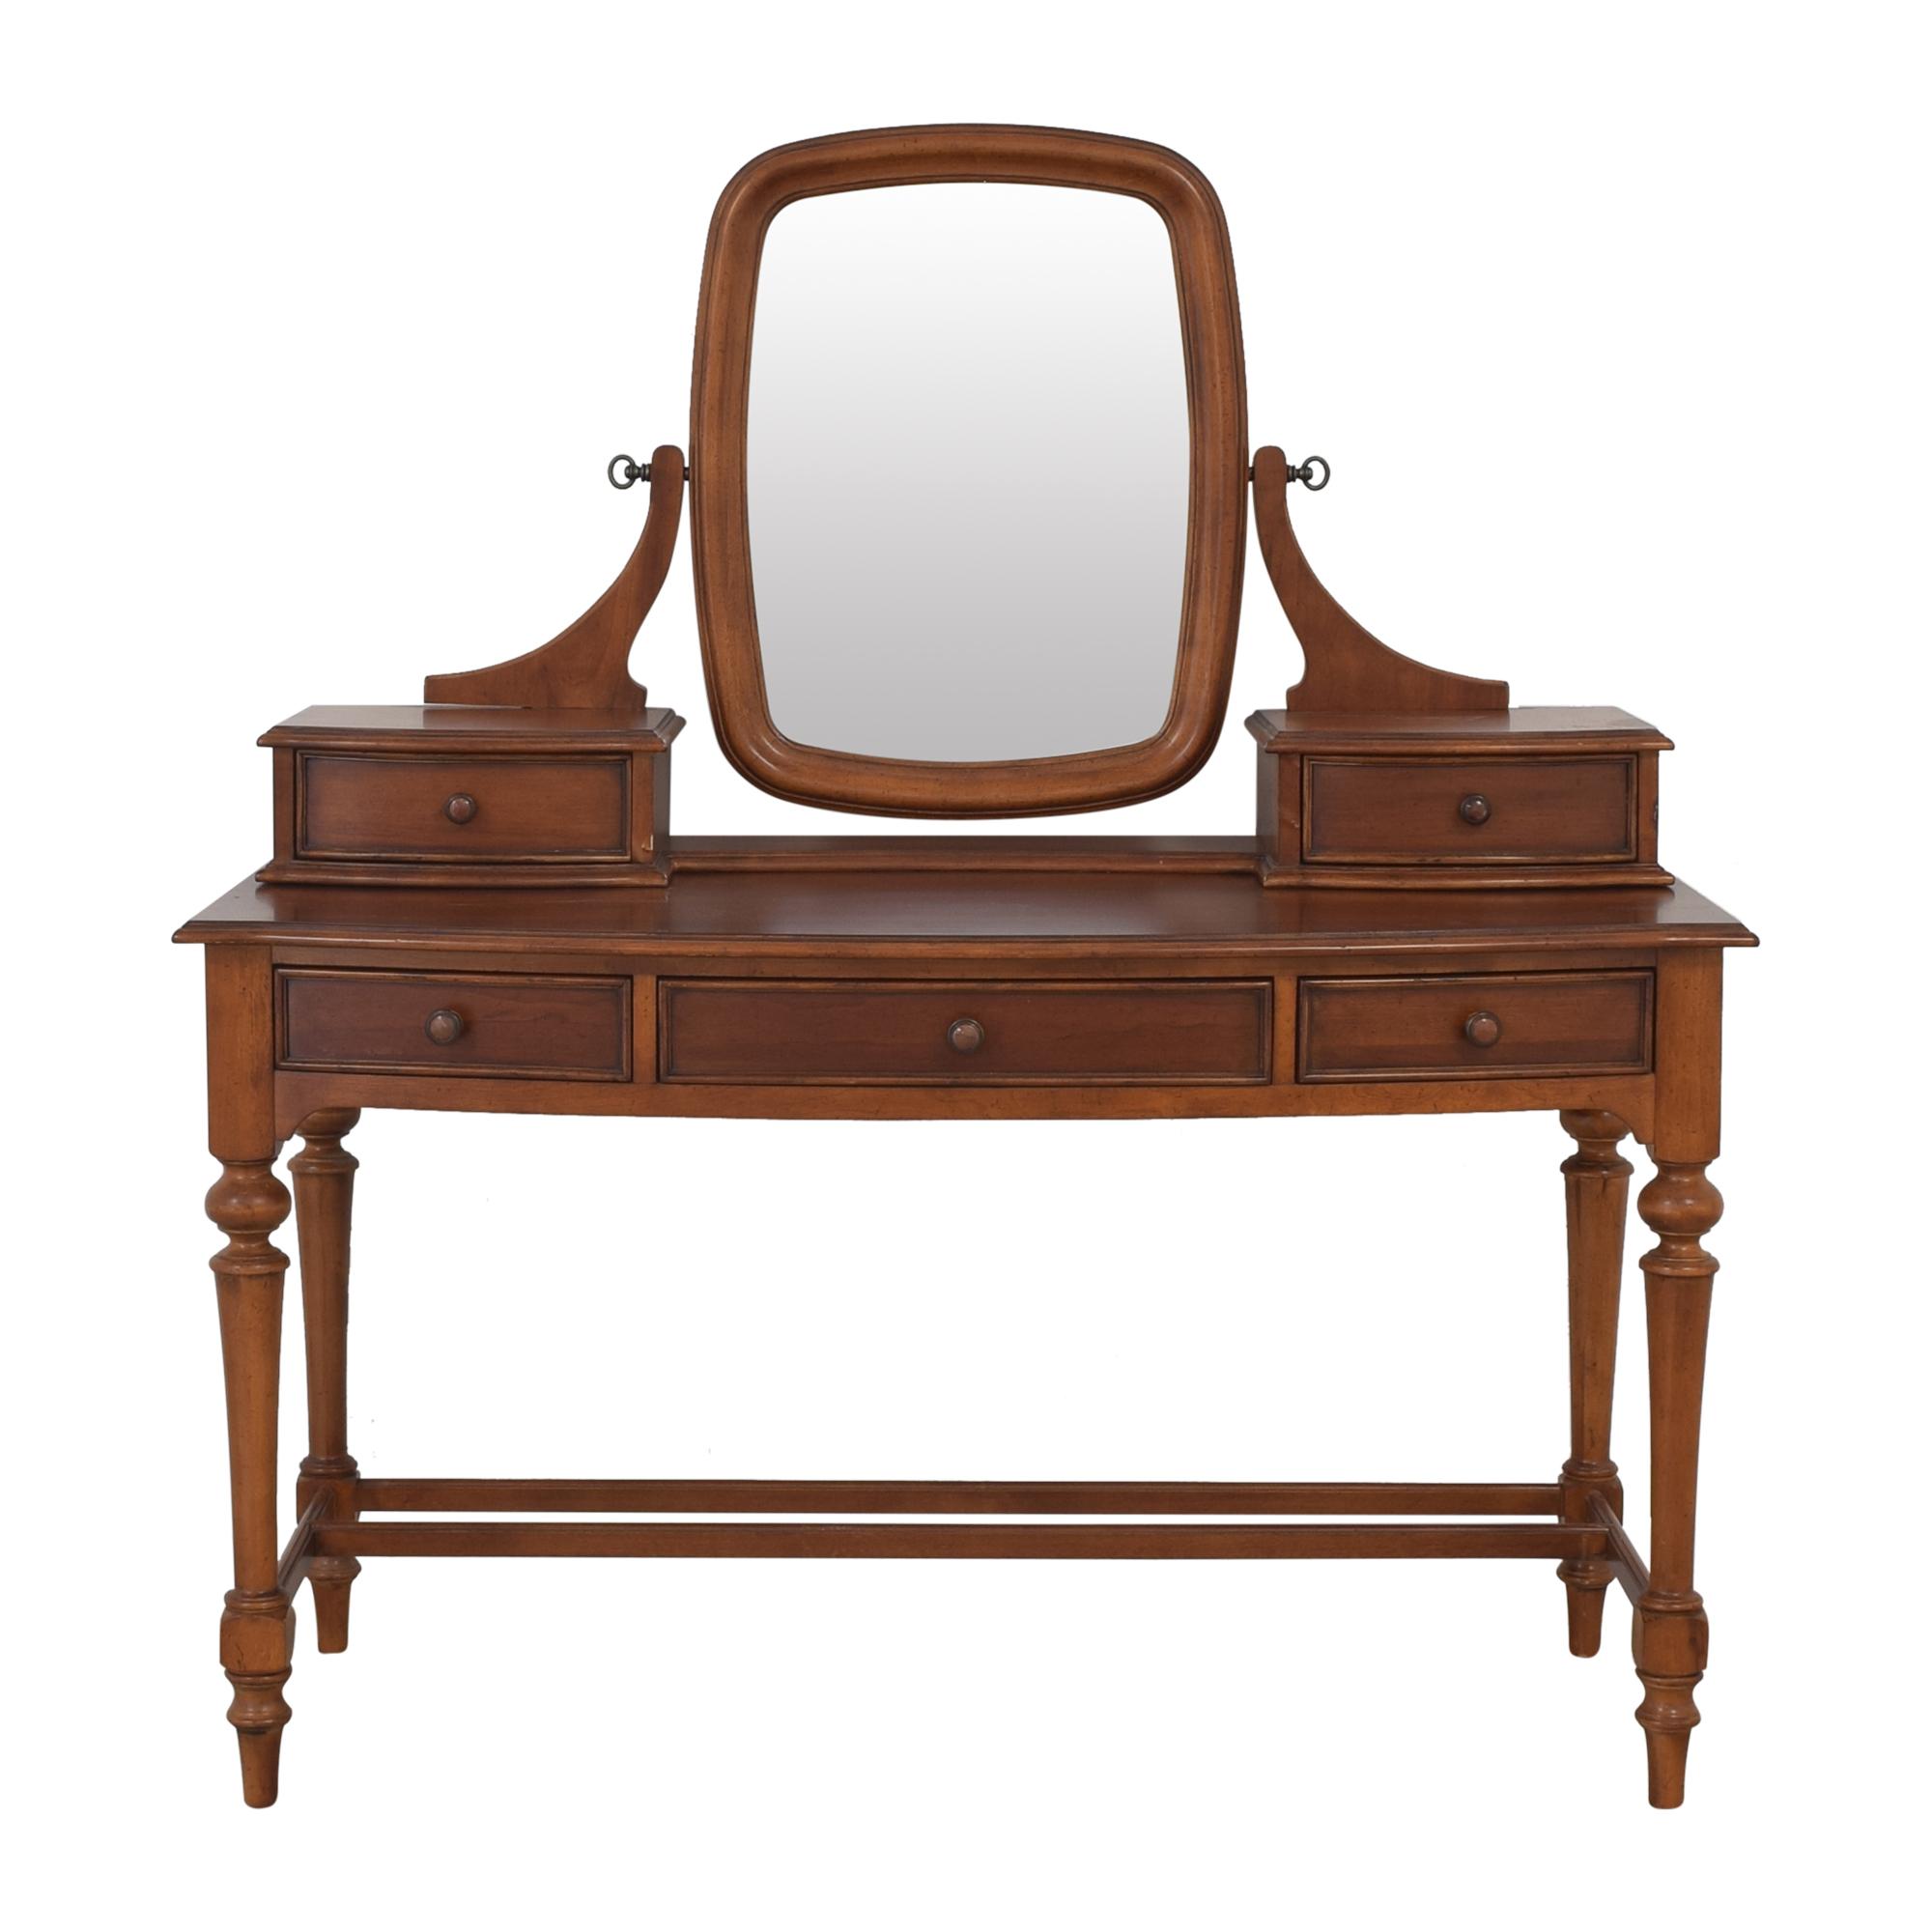 Thomasville Thomasville Felicity Vanity Desk with Mirror price